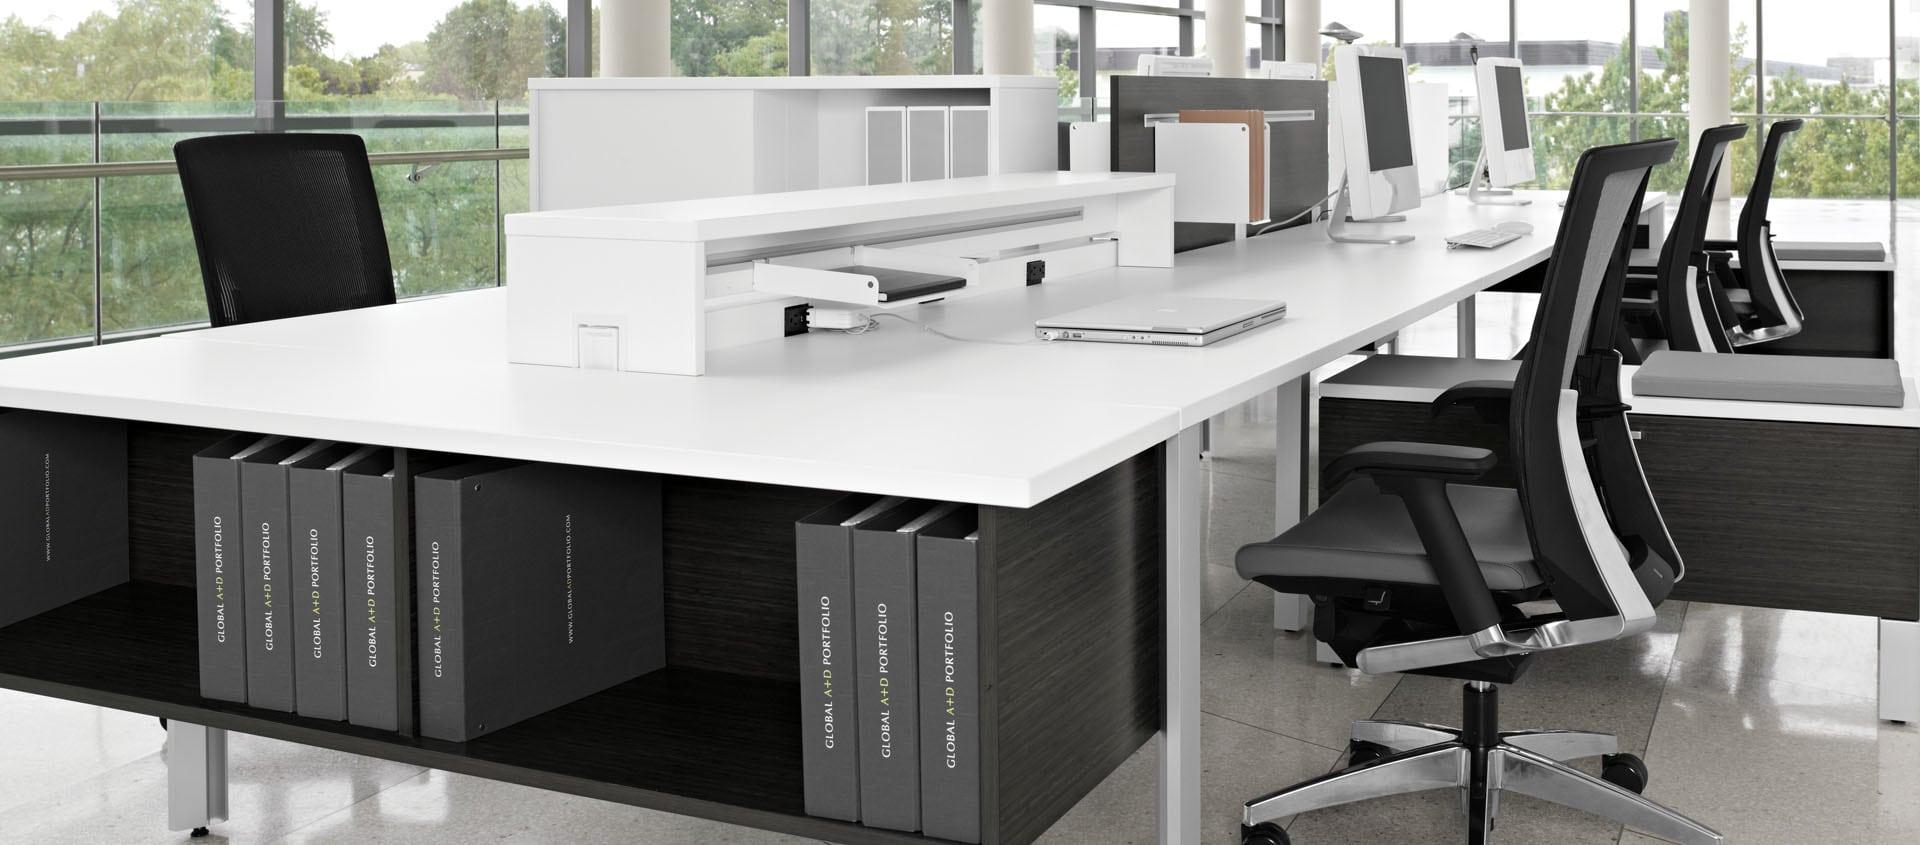 Bridges II - Collaborative Workspace